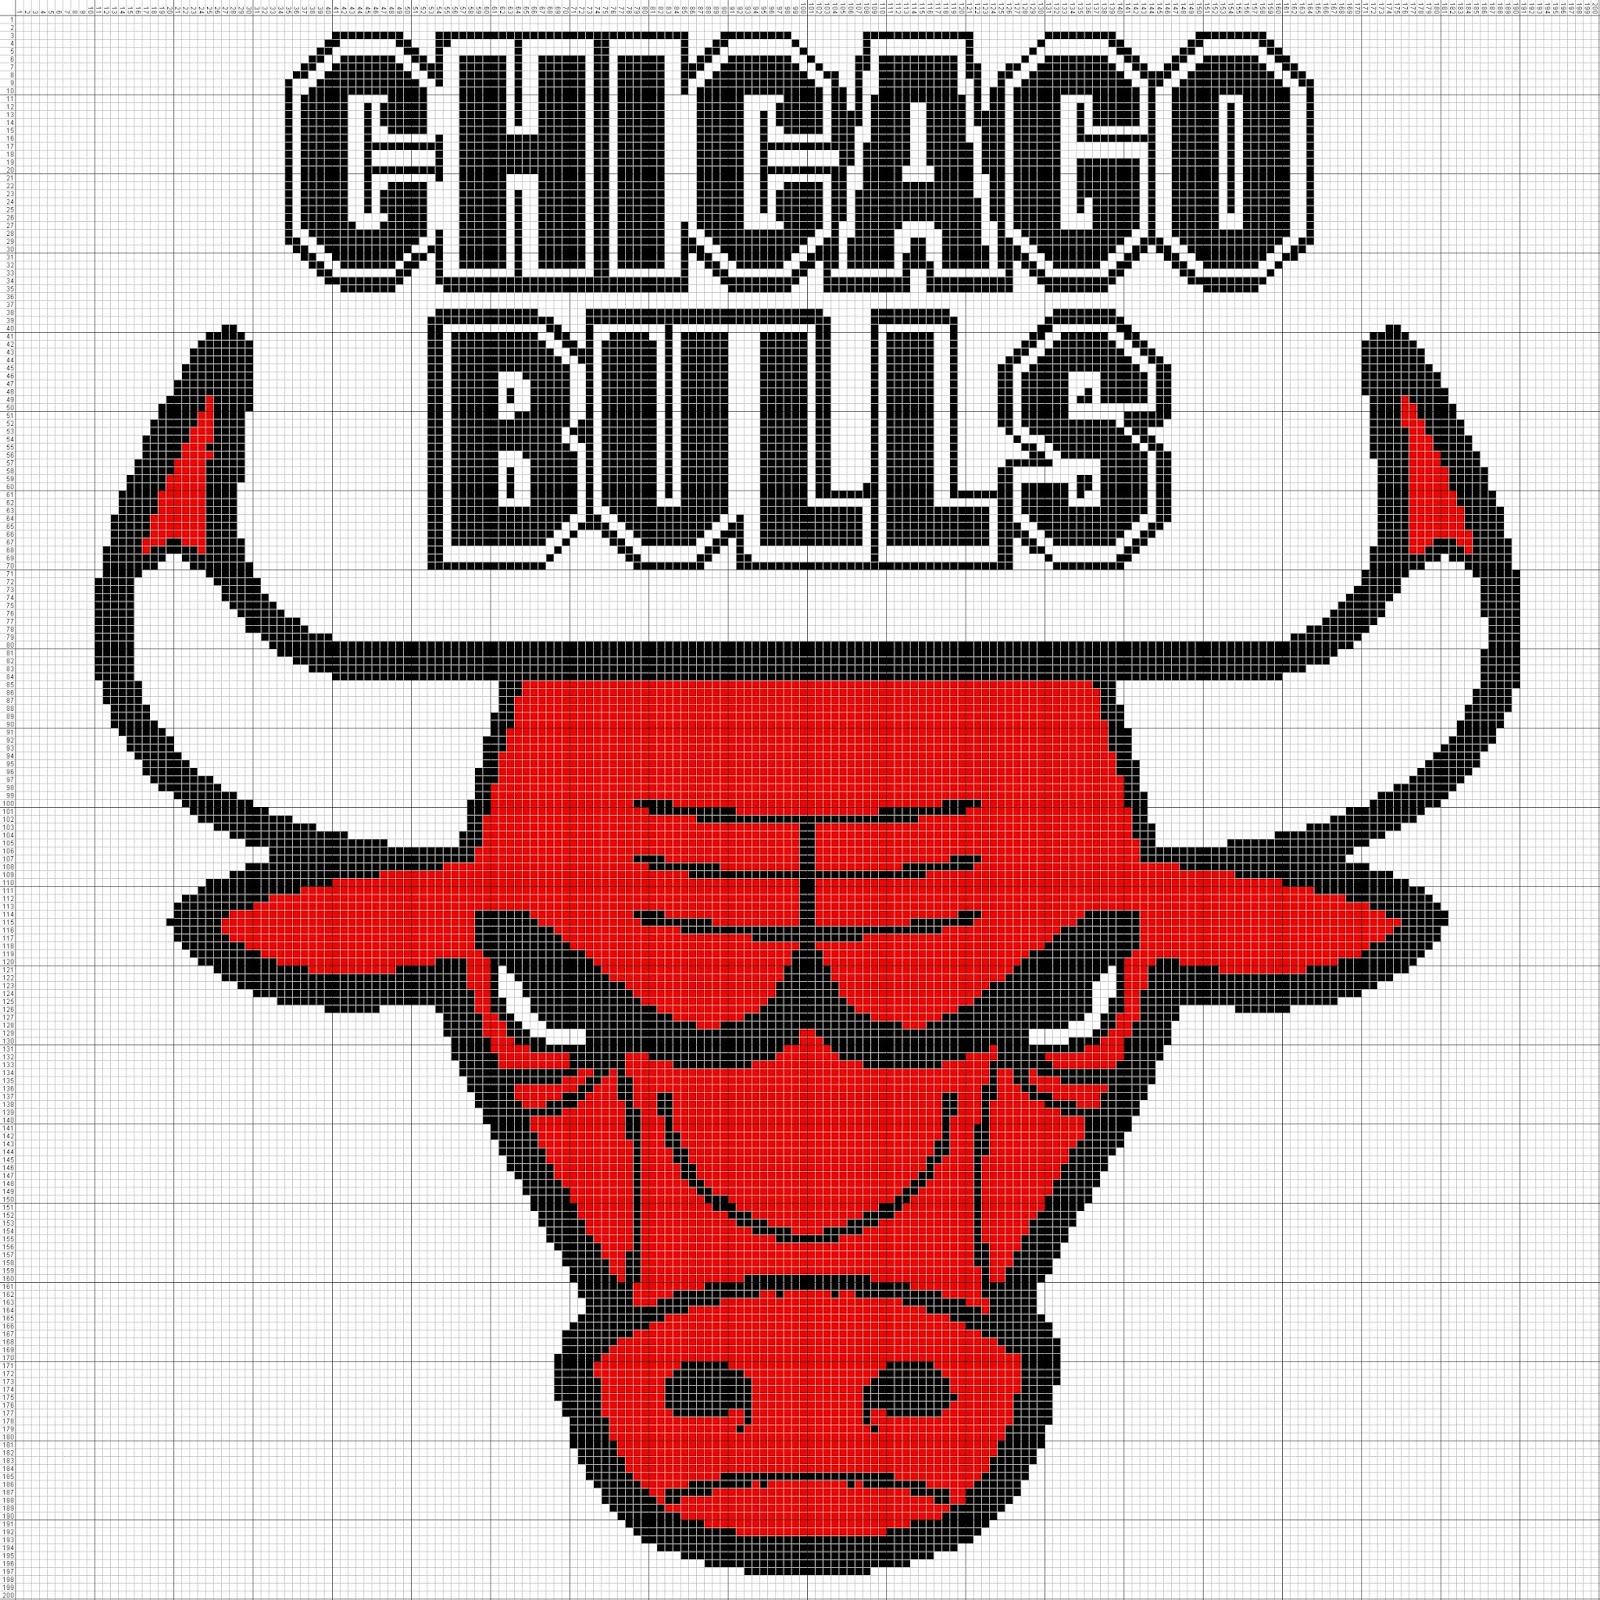 Gambar Pola Kristik Logo Klub Bola Basket NBA - Chicago Bulls